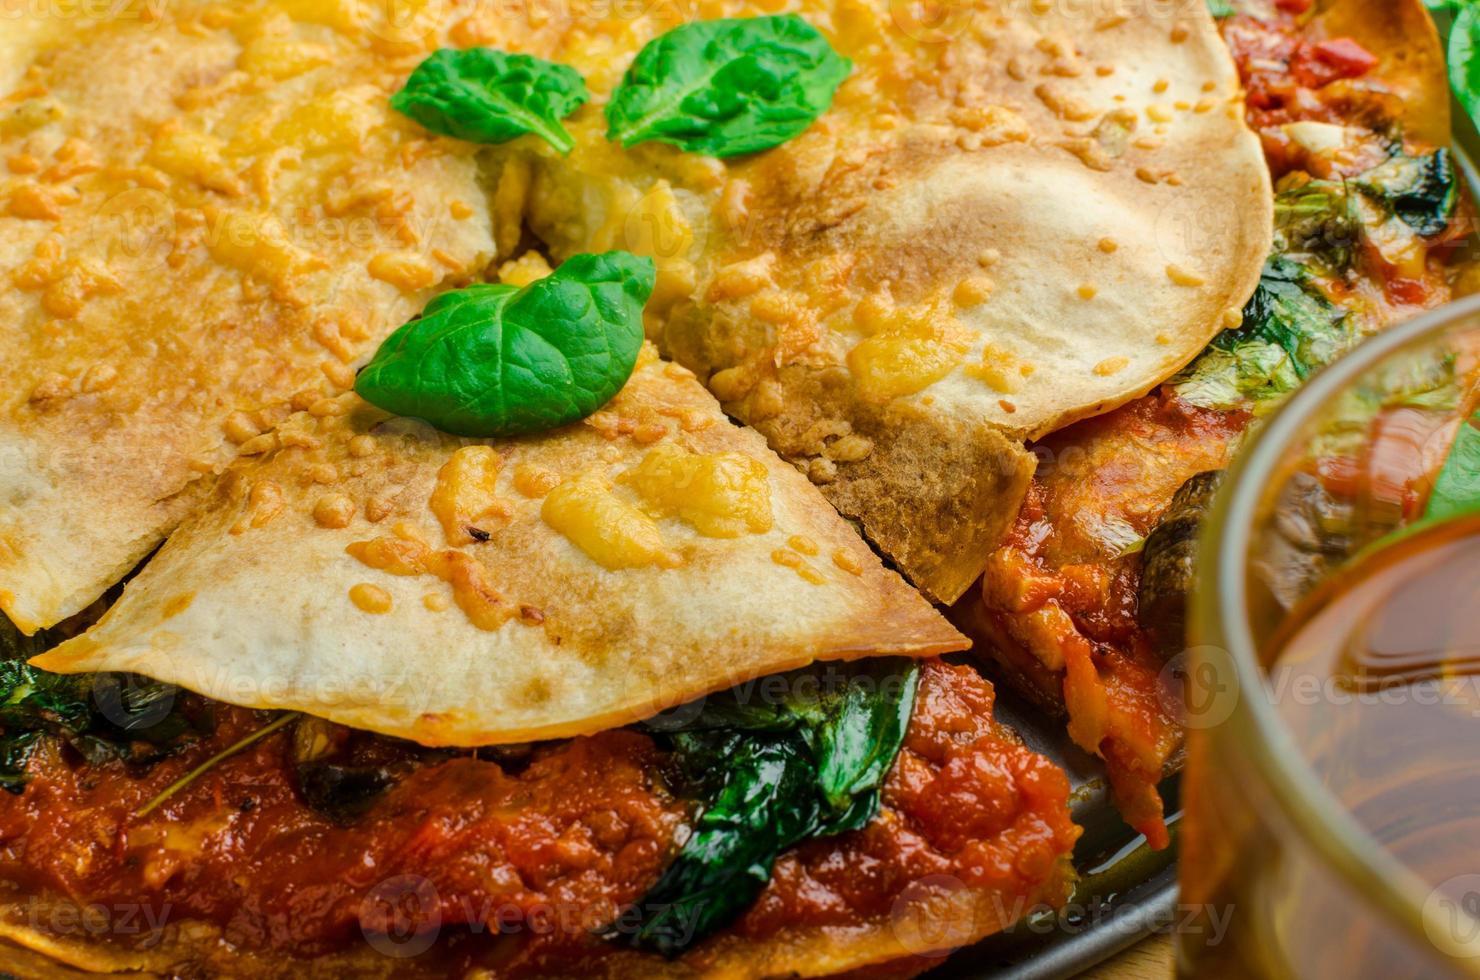 Vegetarian tortilla and bolognese sauce photo